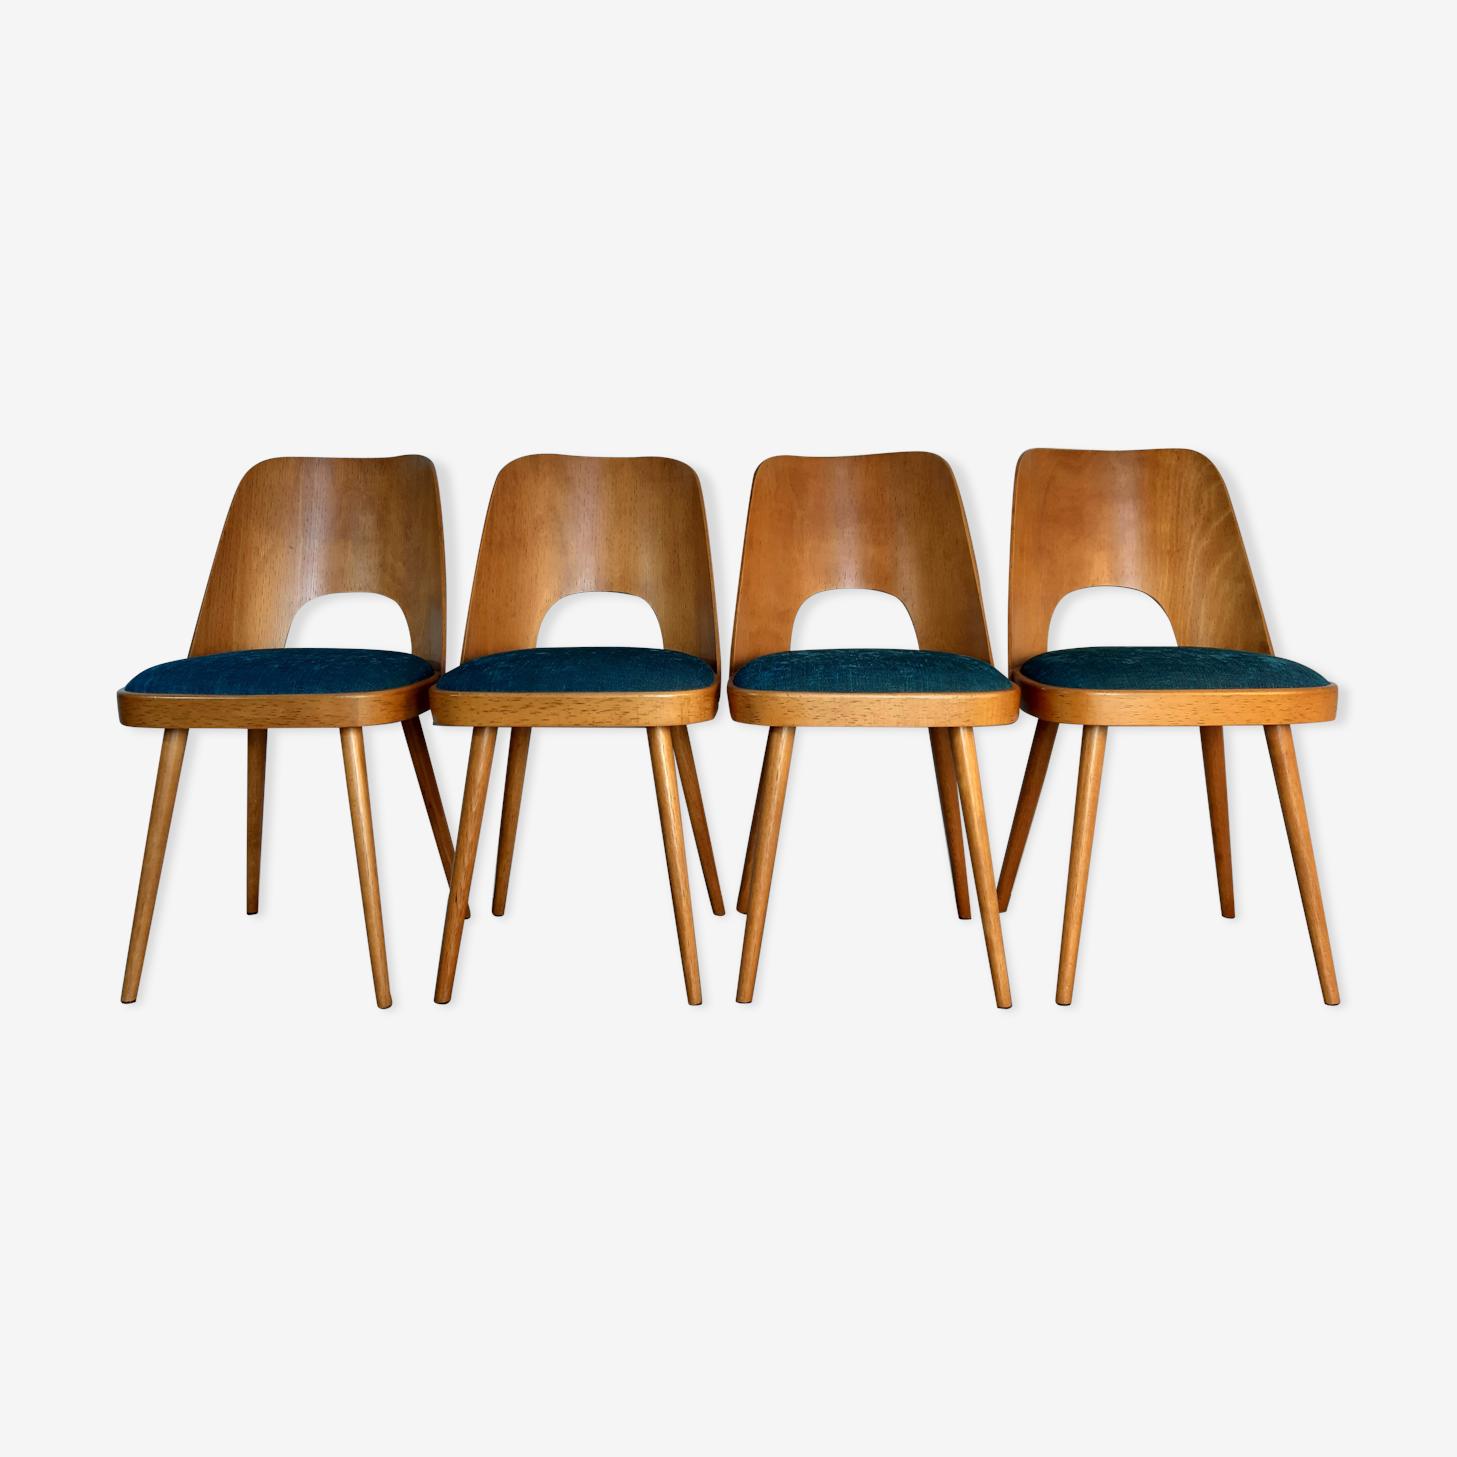 Set of 4 chairs by Oswald Haerdtl for Ton, Czechoslovakia 1955